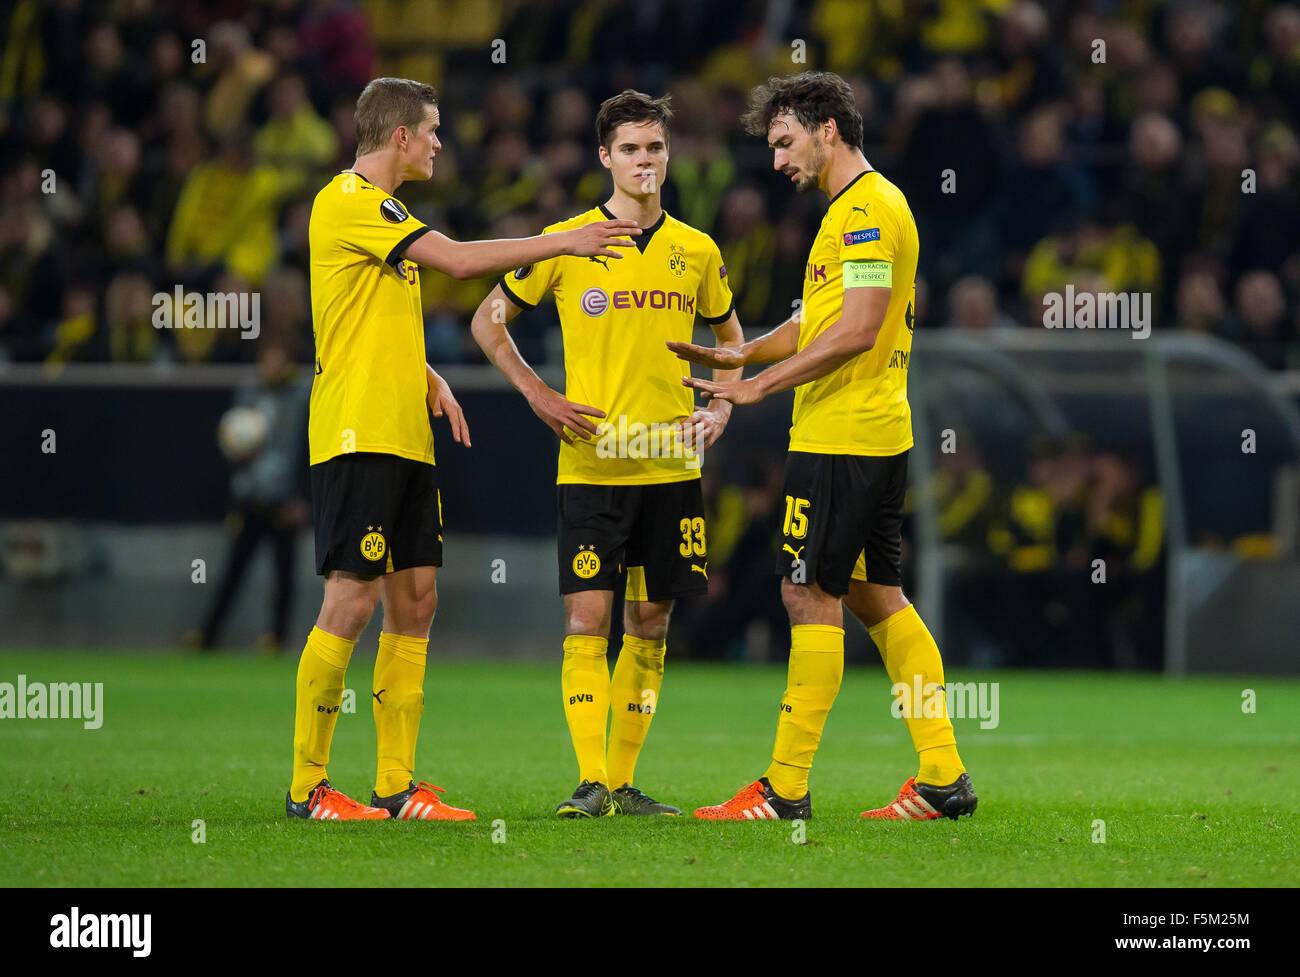 Dortmund Germany 5th Nov 2015 Dortmund s Mats Hummels R